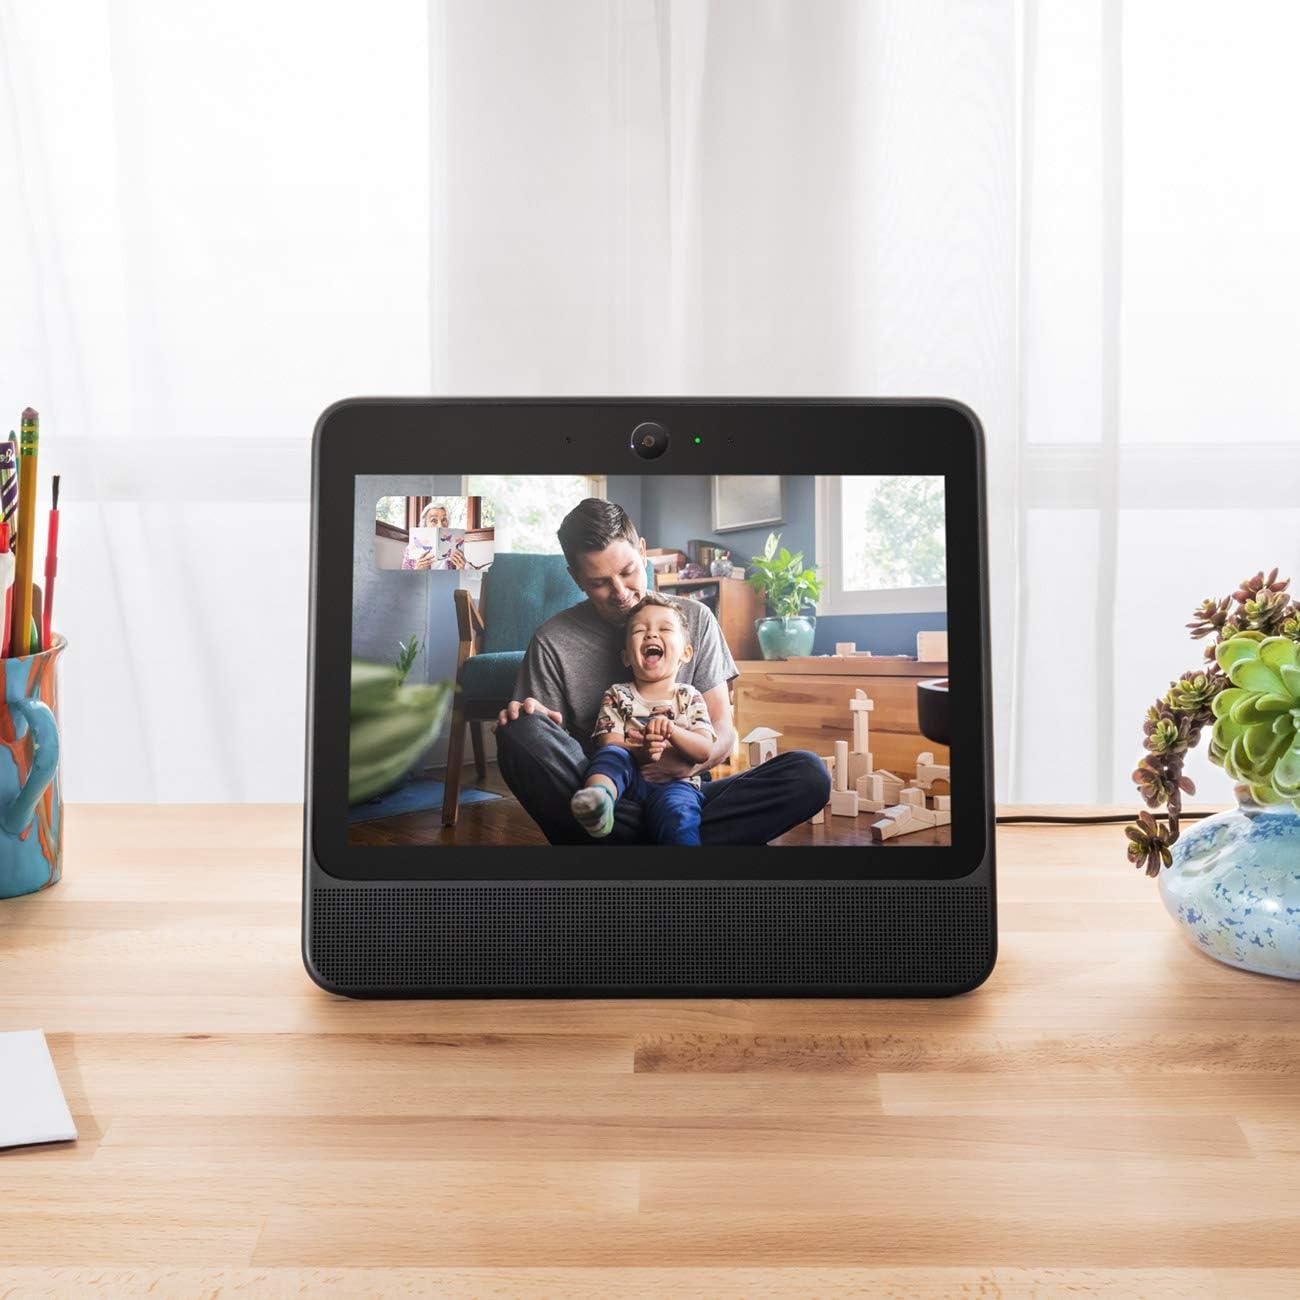 Gen 1 Portal from Facebook Hands-Free Video Calling with Alexa Built-in Smart